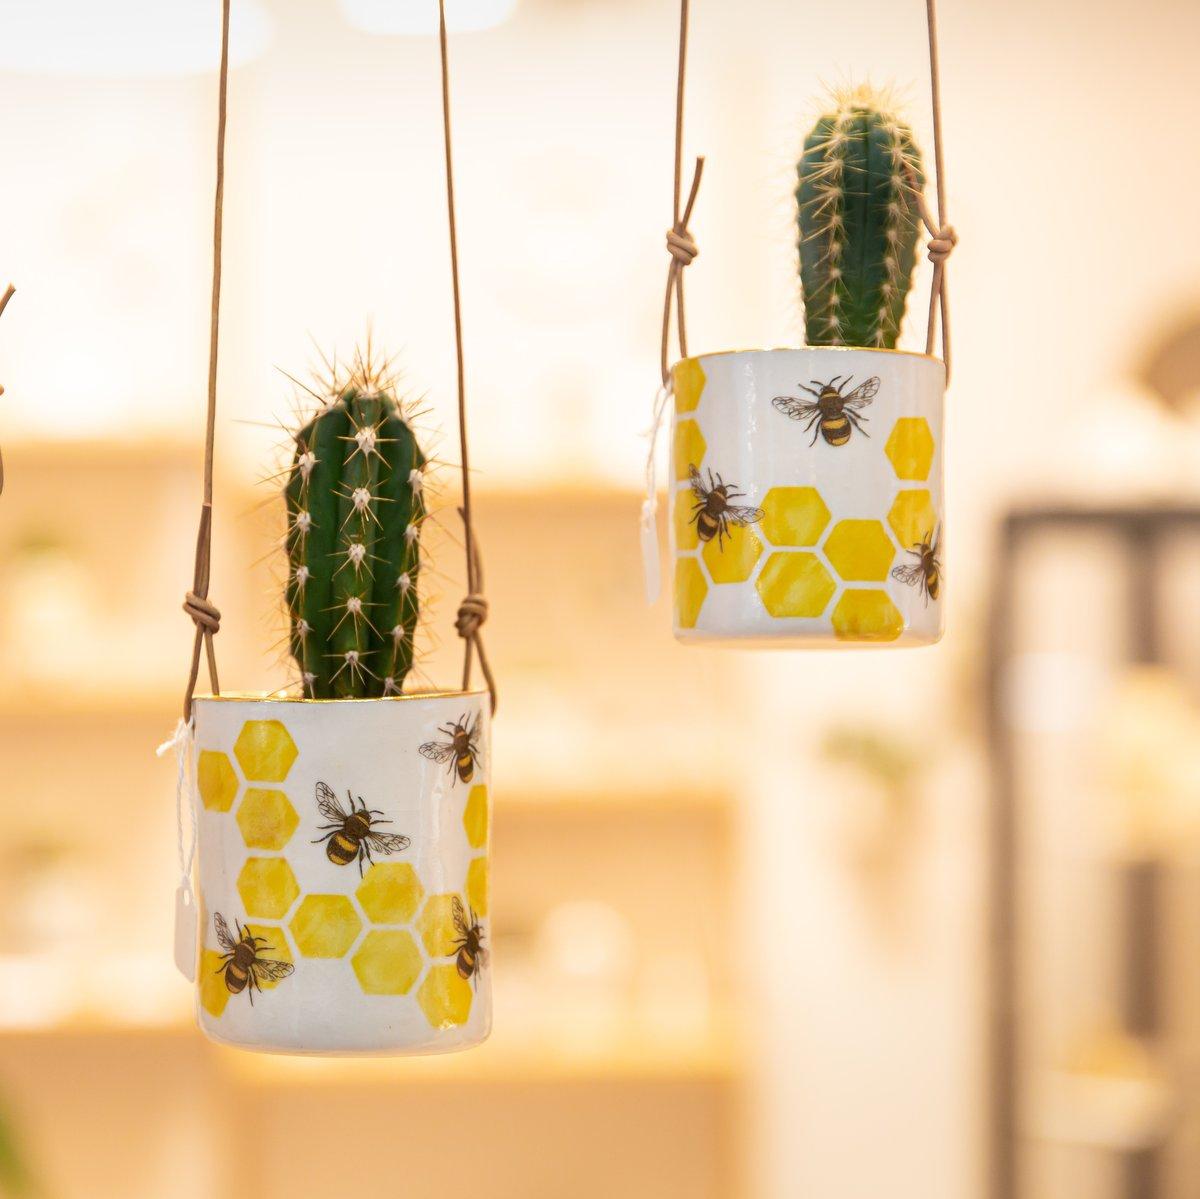 Porcelain hanging bee planter